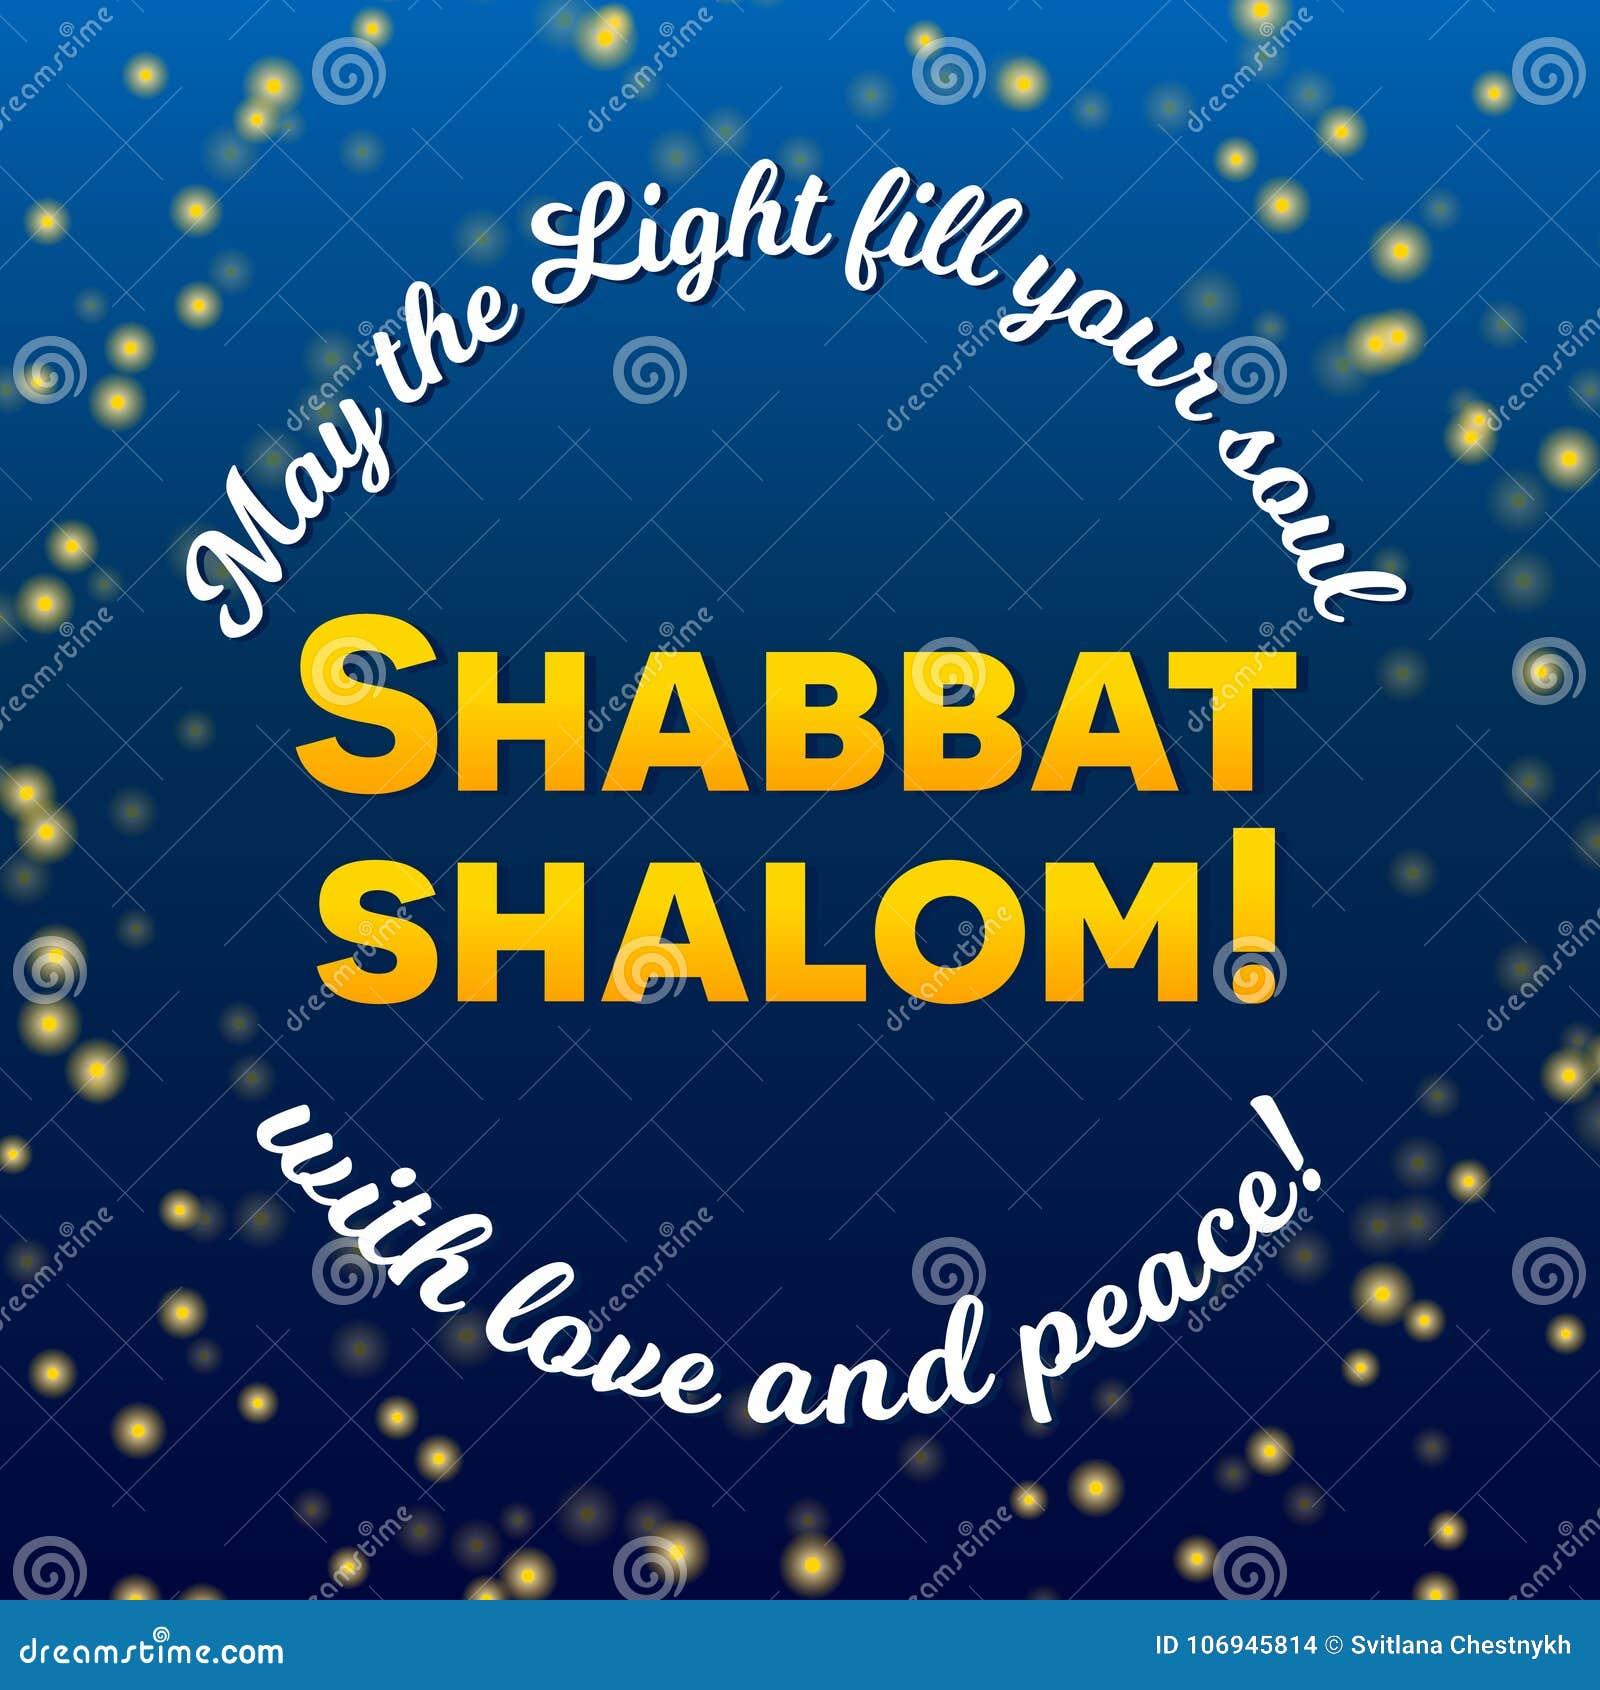 Shabbat shalom candles greeting card lettering starry night sky download shabbat shalom candles greeting card lettering starry night sky background stock vector illustration m4hsunfo